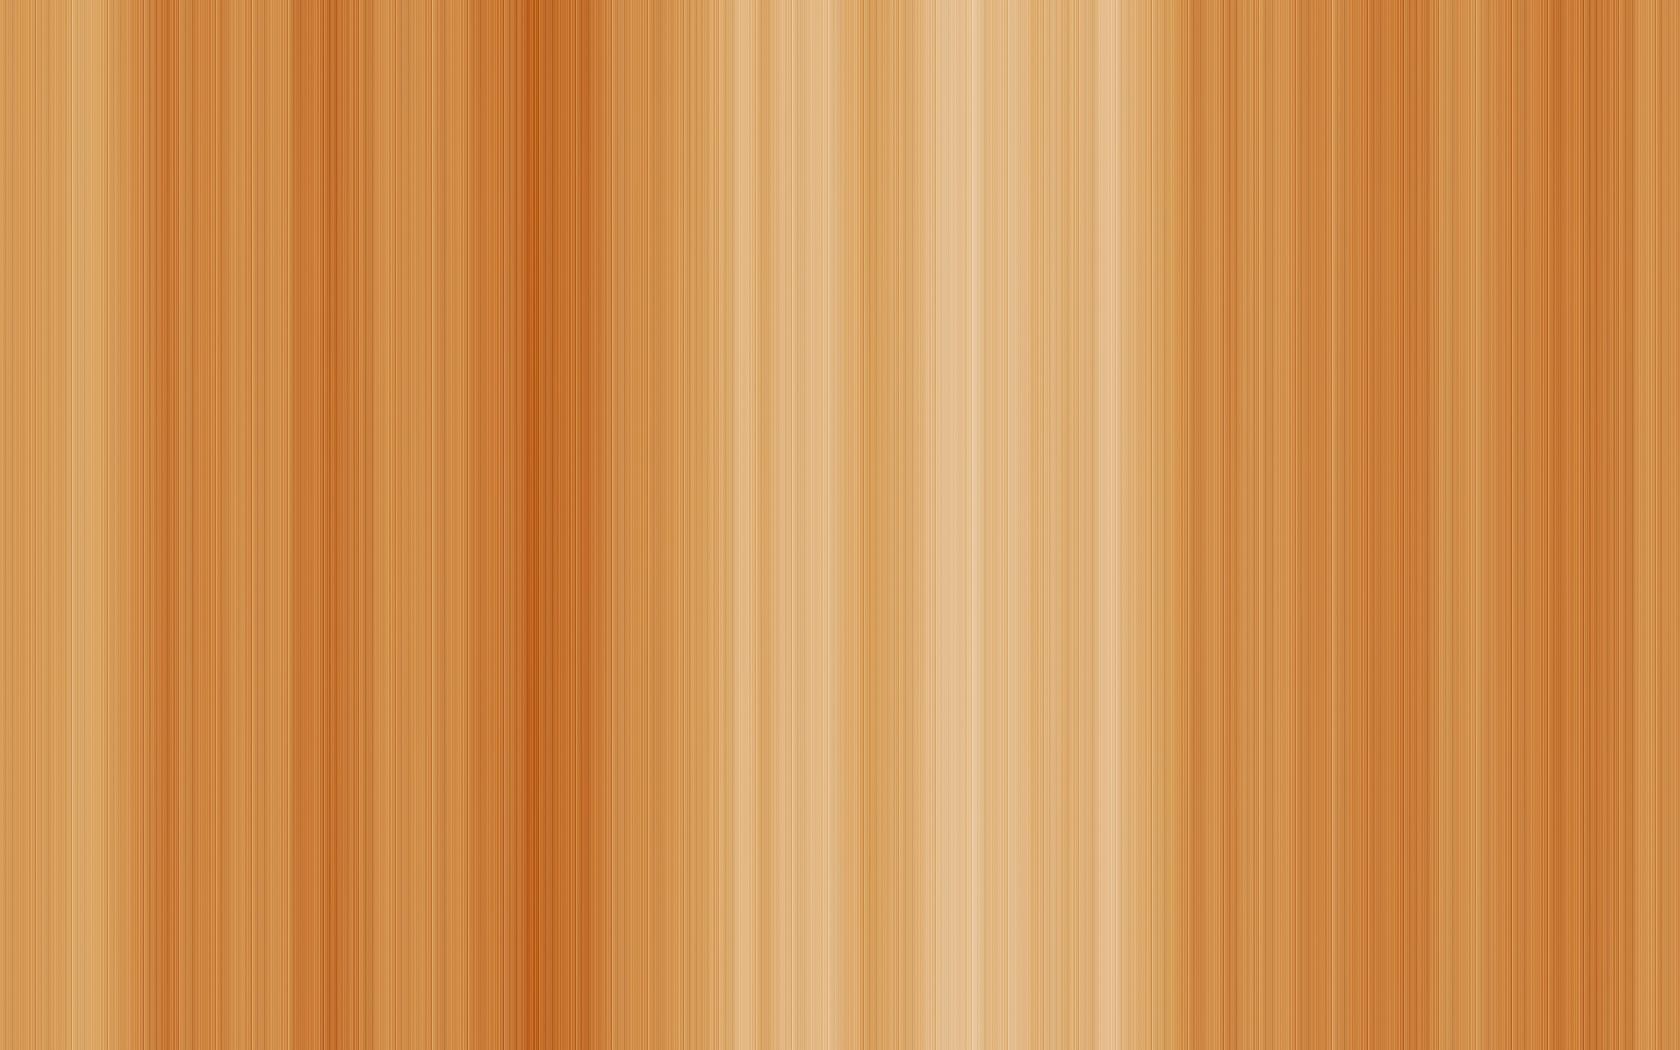 wood design wallpaper photo - 9